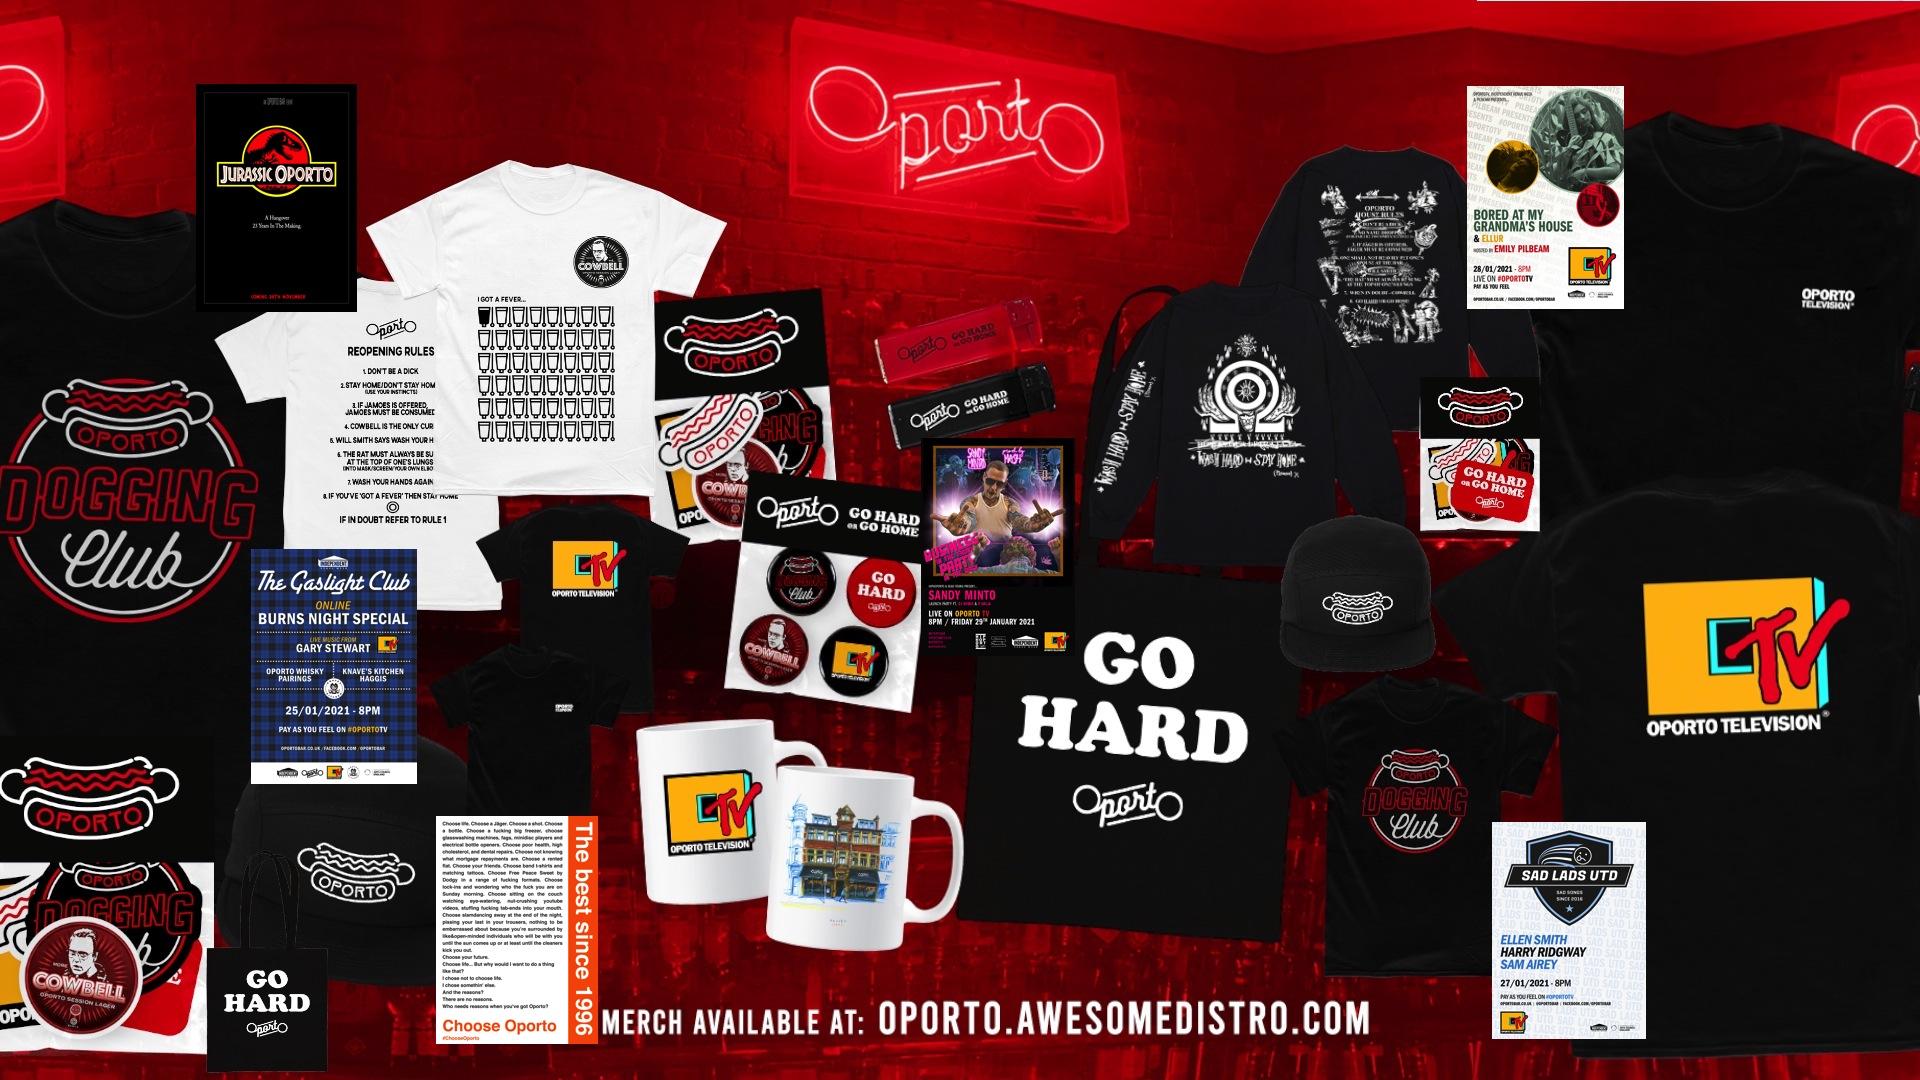 Oporto merch sale on now!